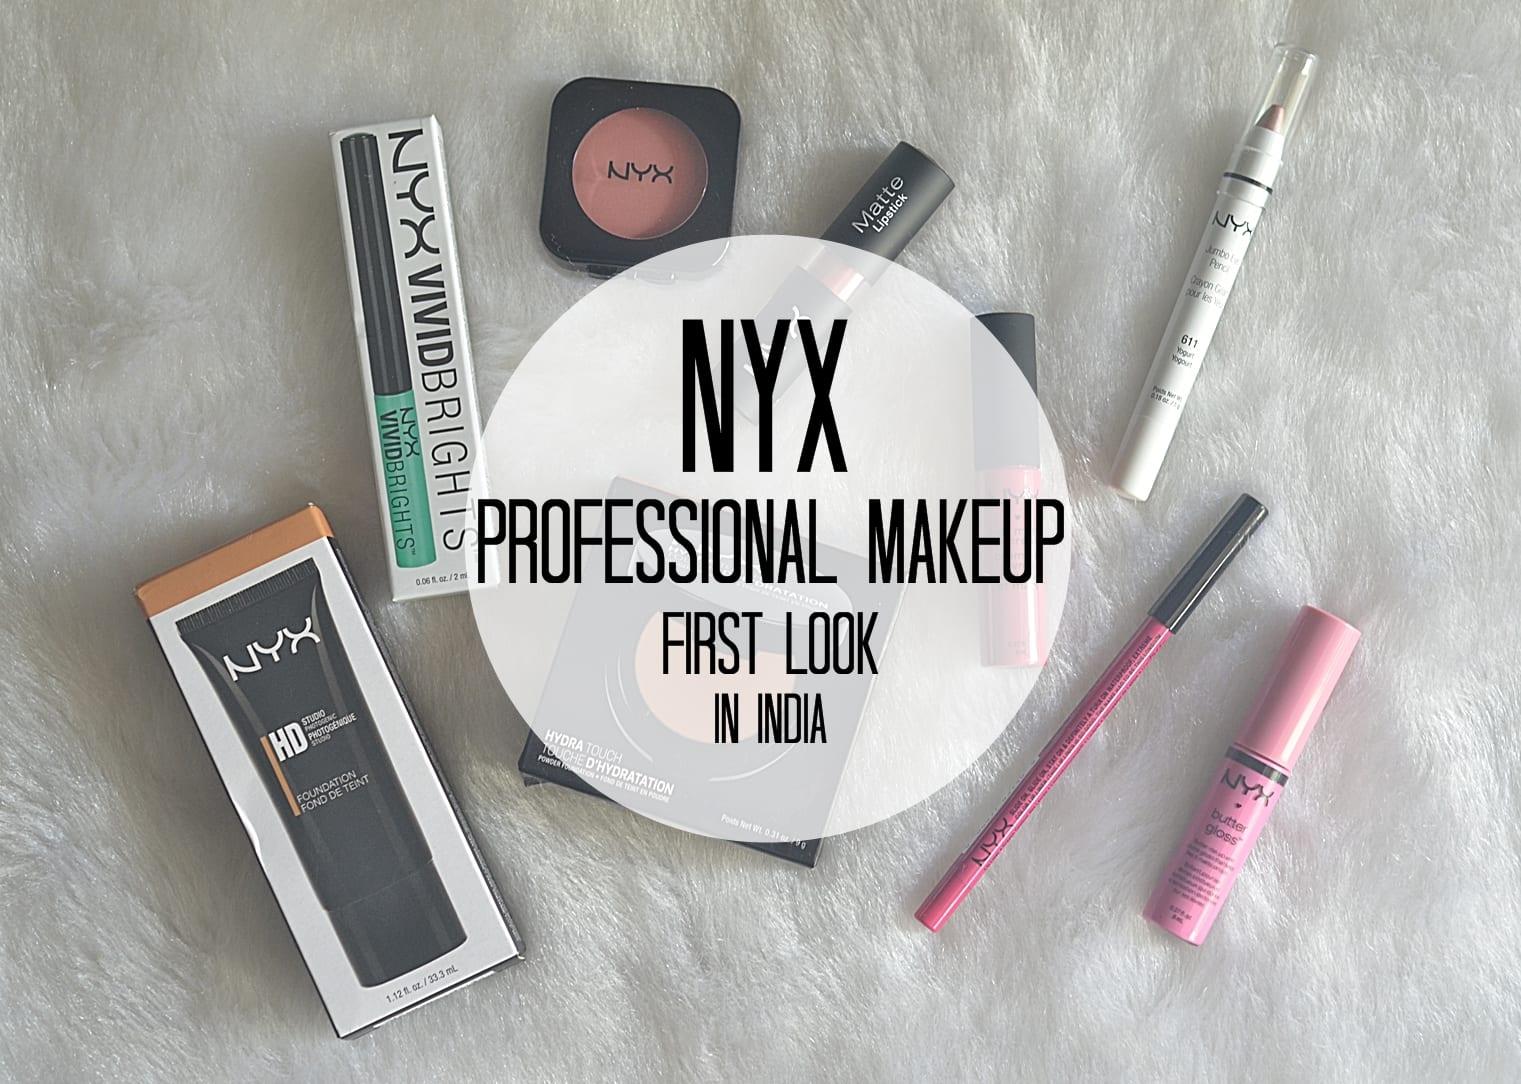 NYX-Cosmetics-india-makeup (7)